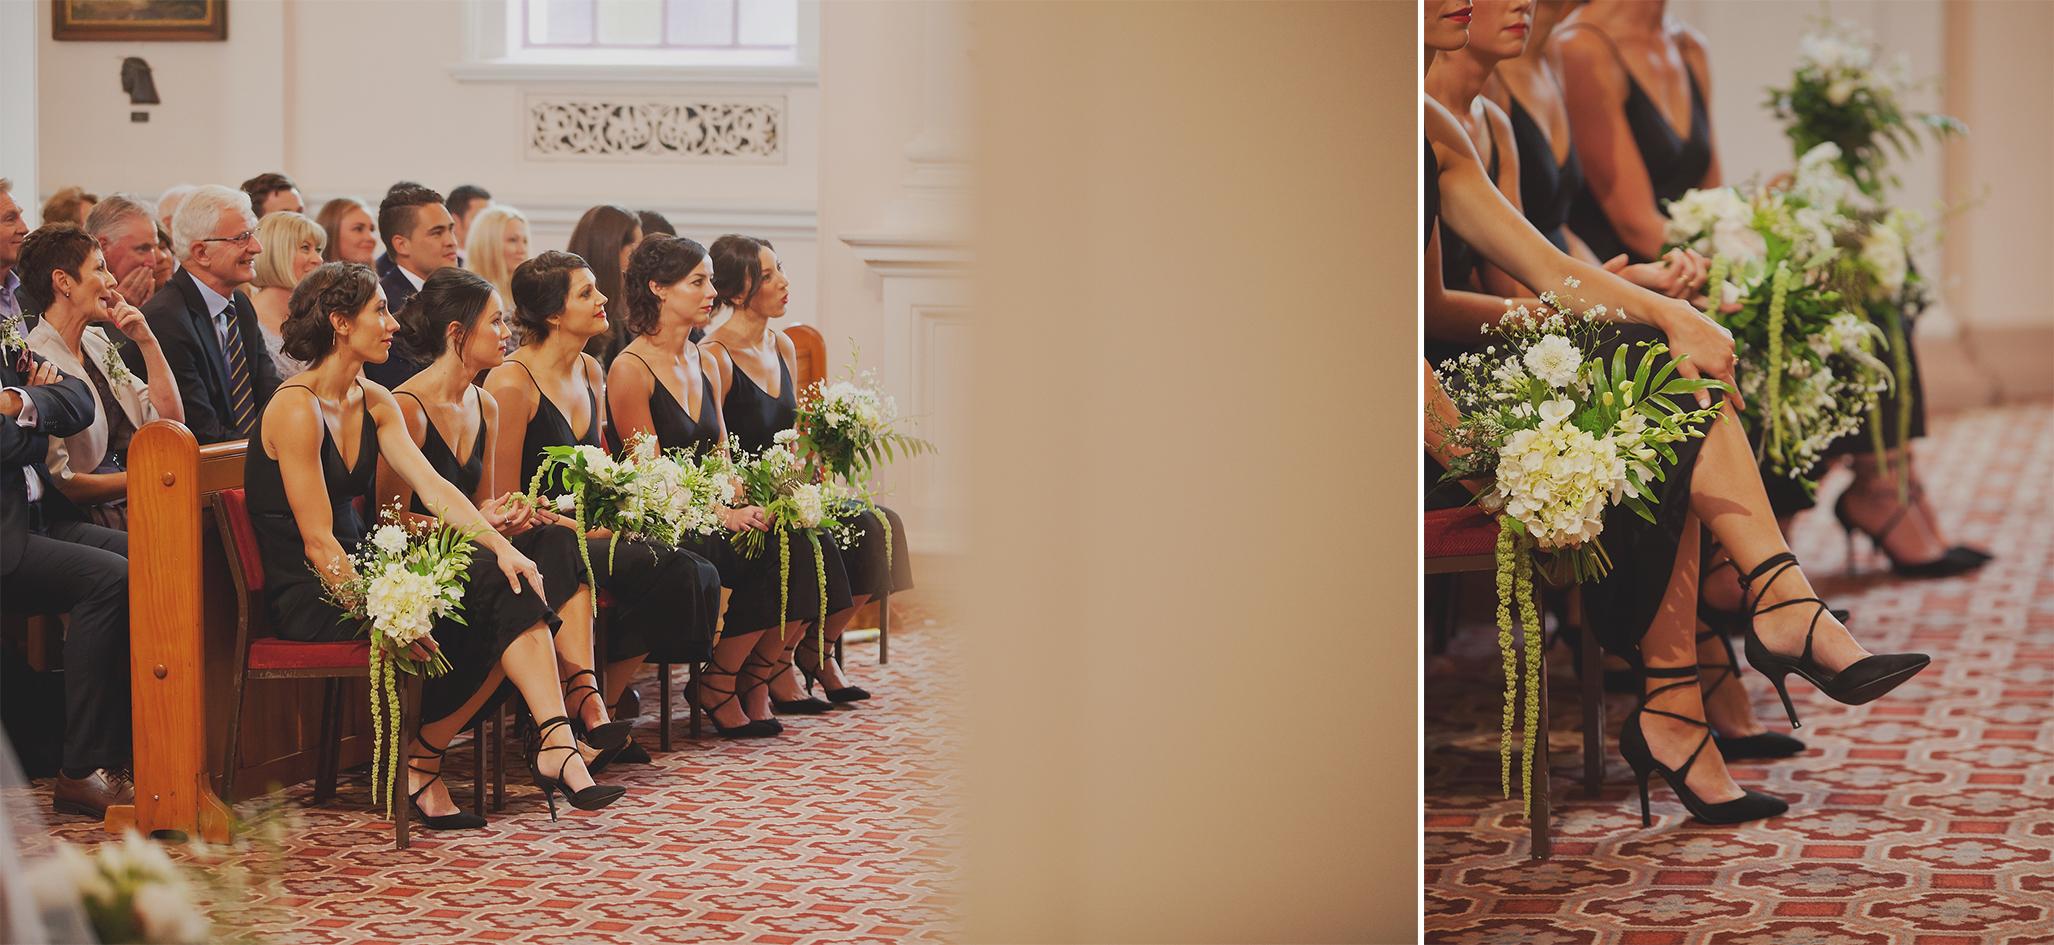 wellington wedding photography NZ - 1215.JPG